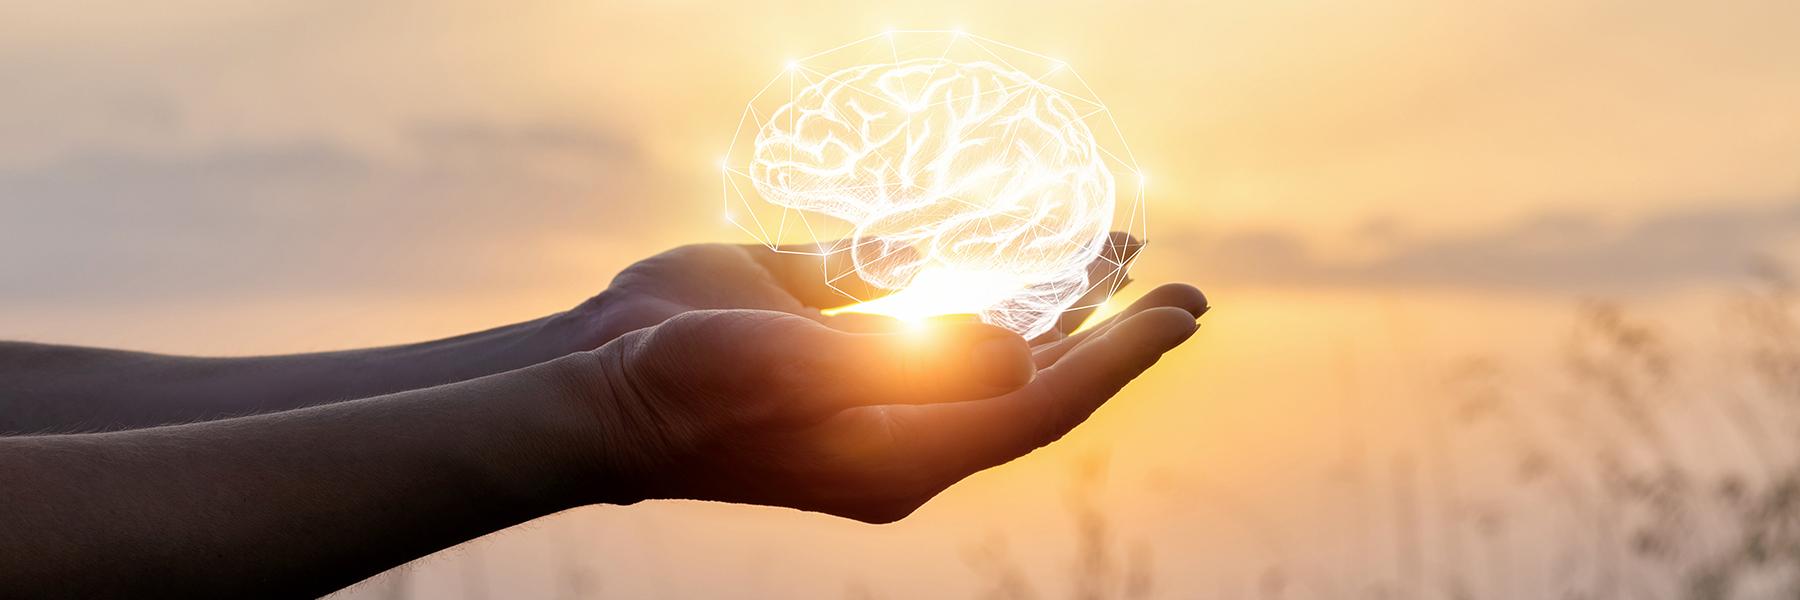 Brain Injury Information | Resources | Ontario Brain Injury Association